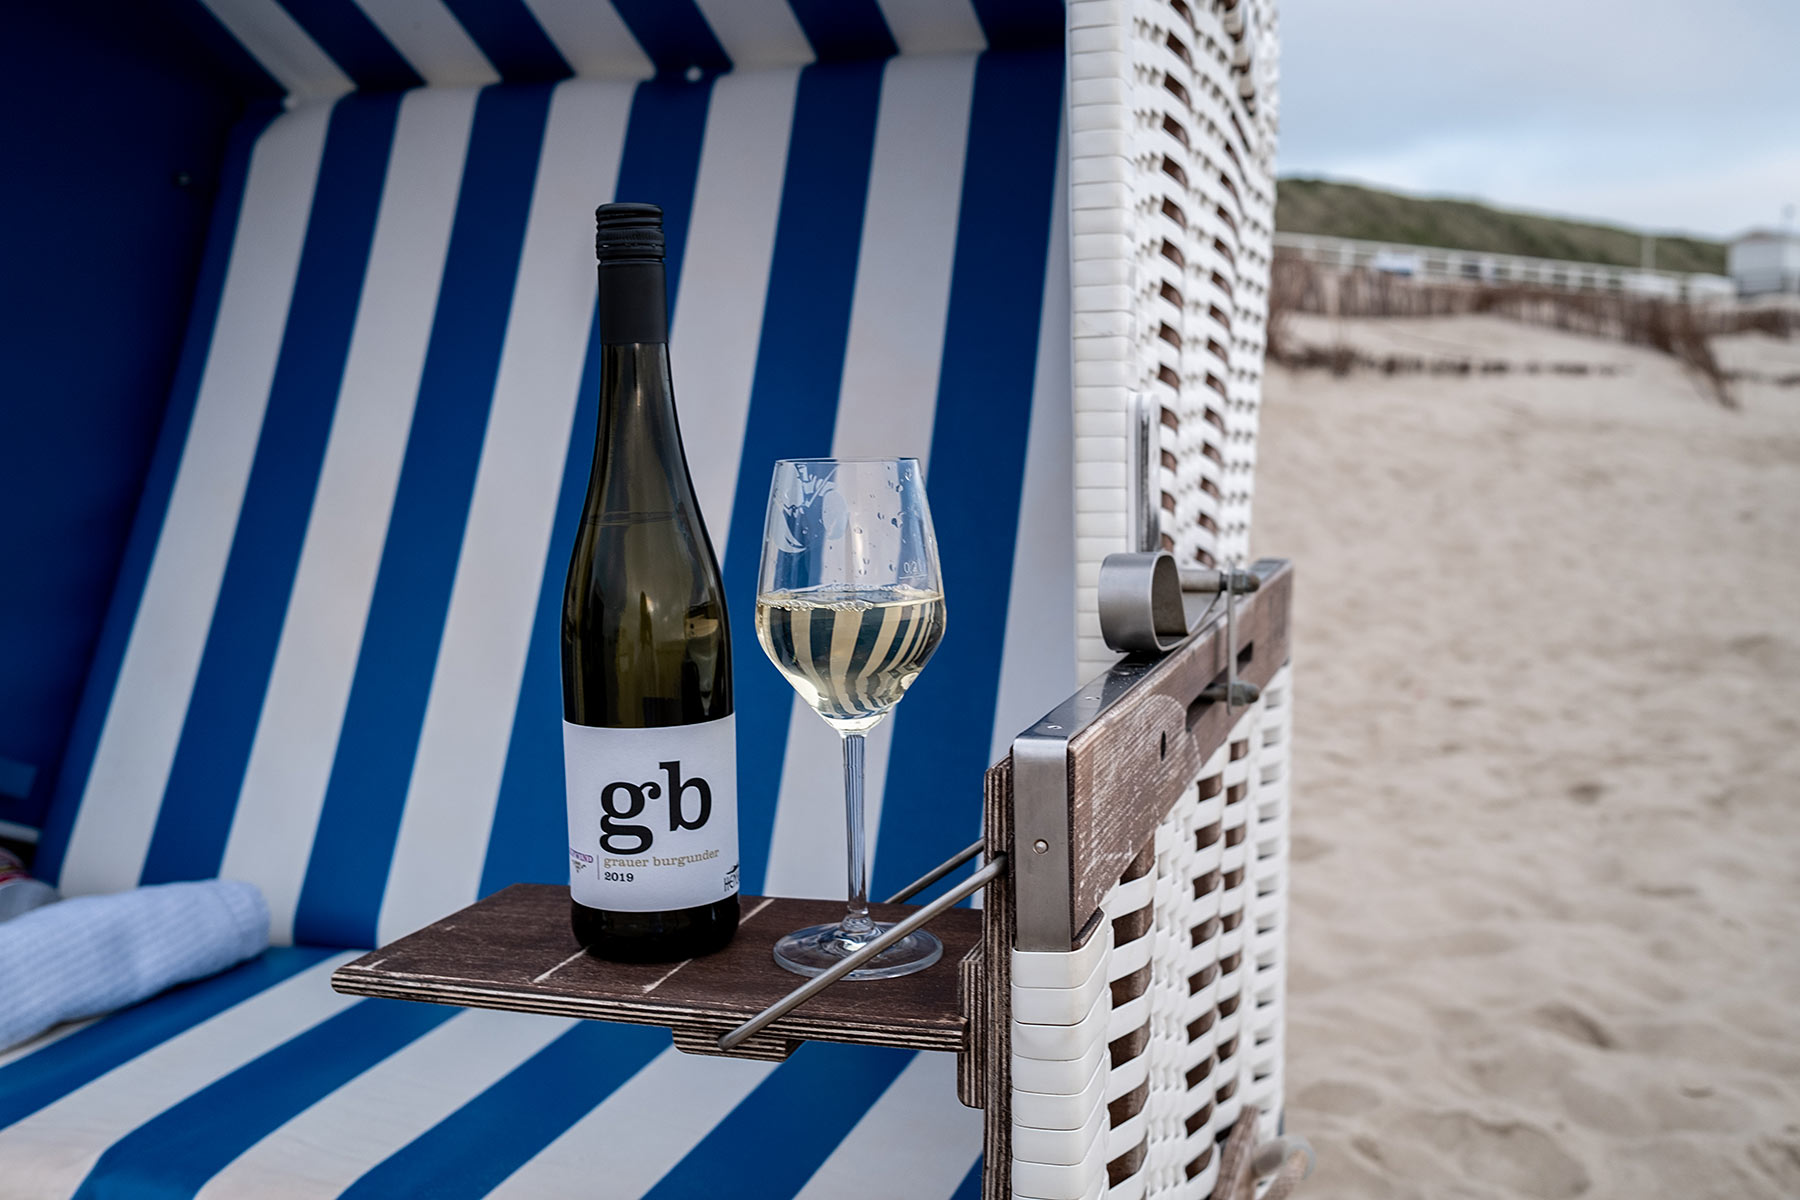 strandkorb sylt travel blog sunnyinga